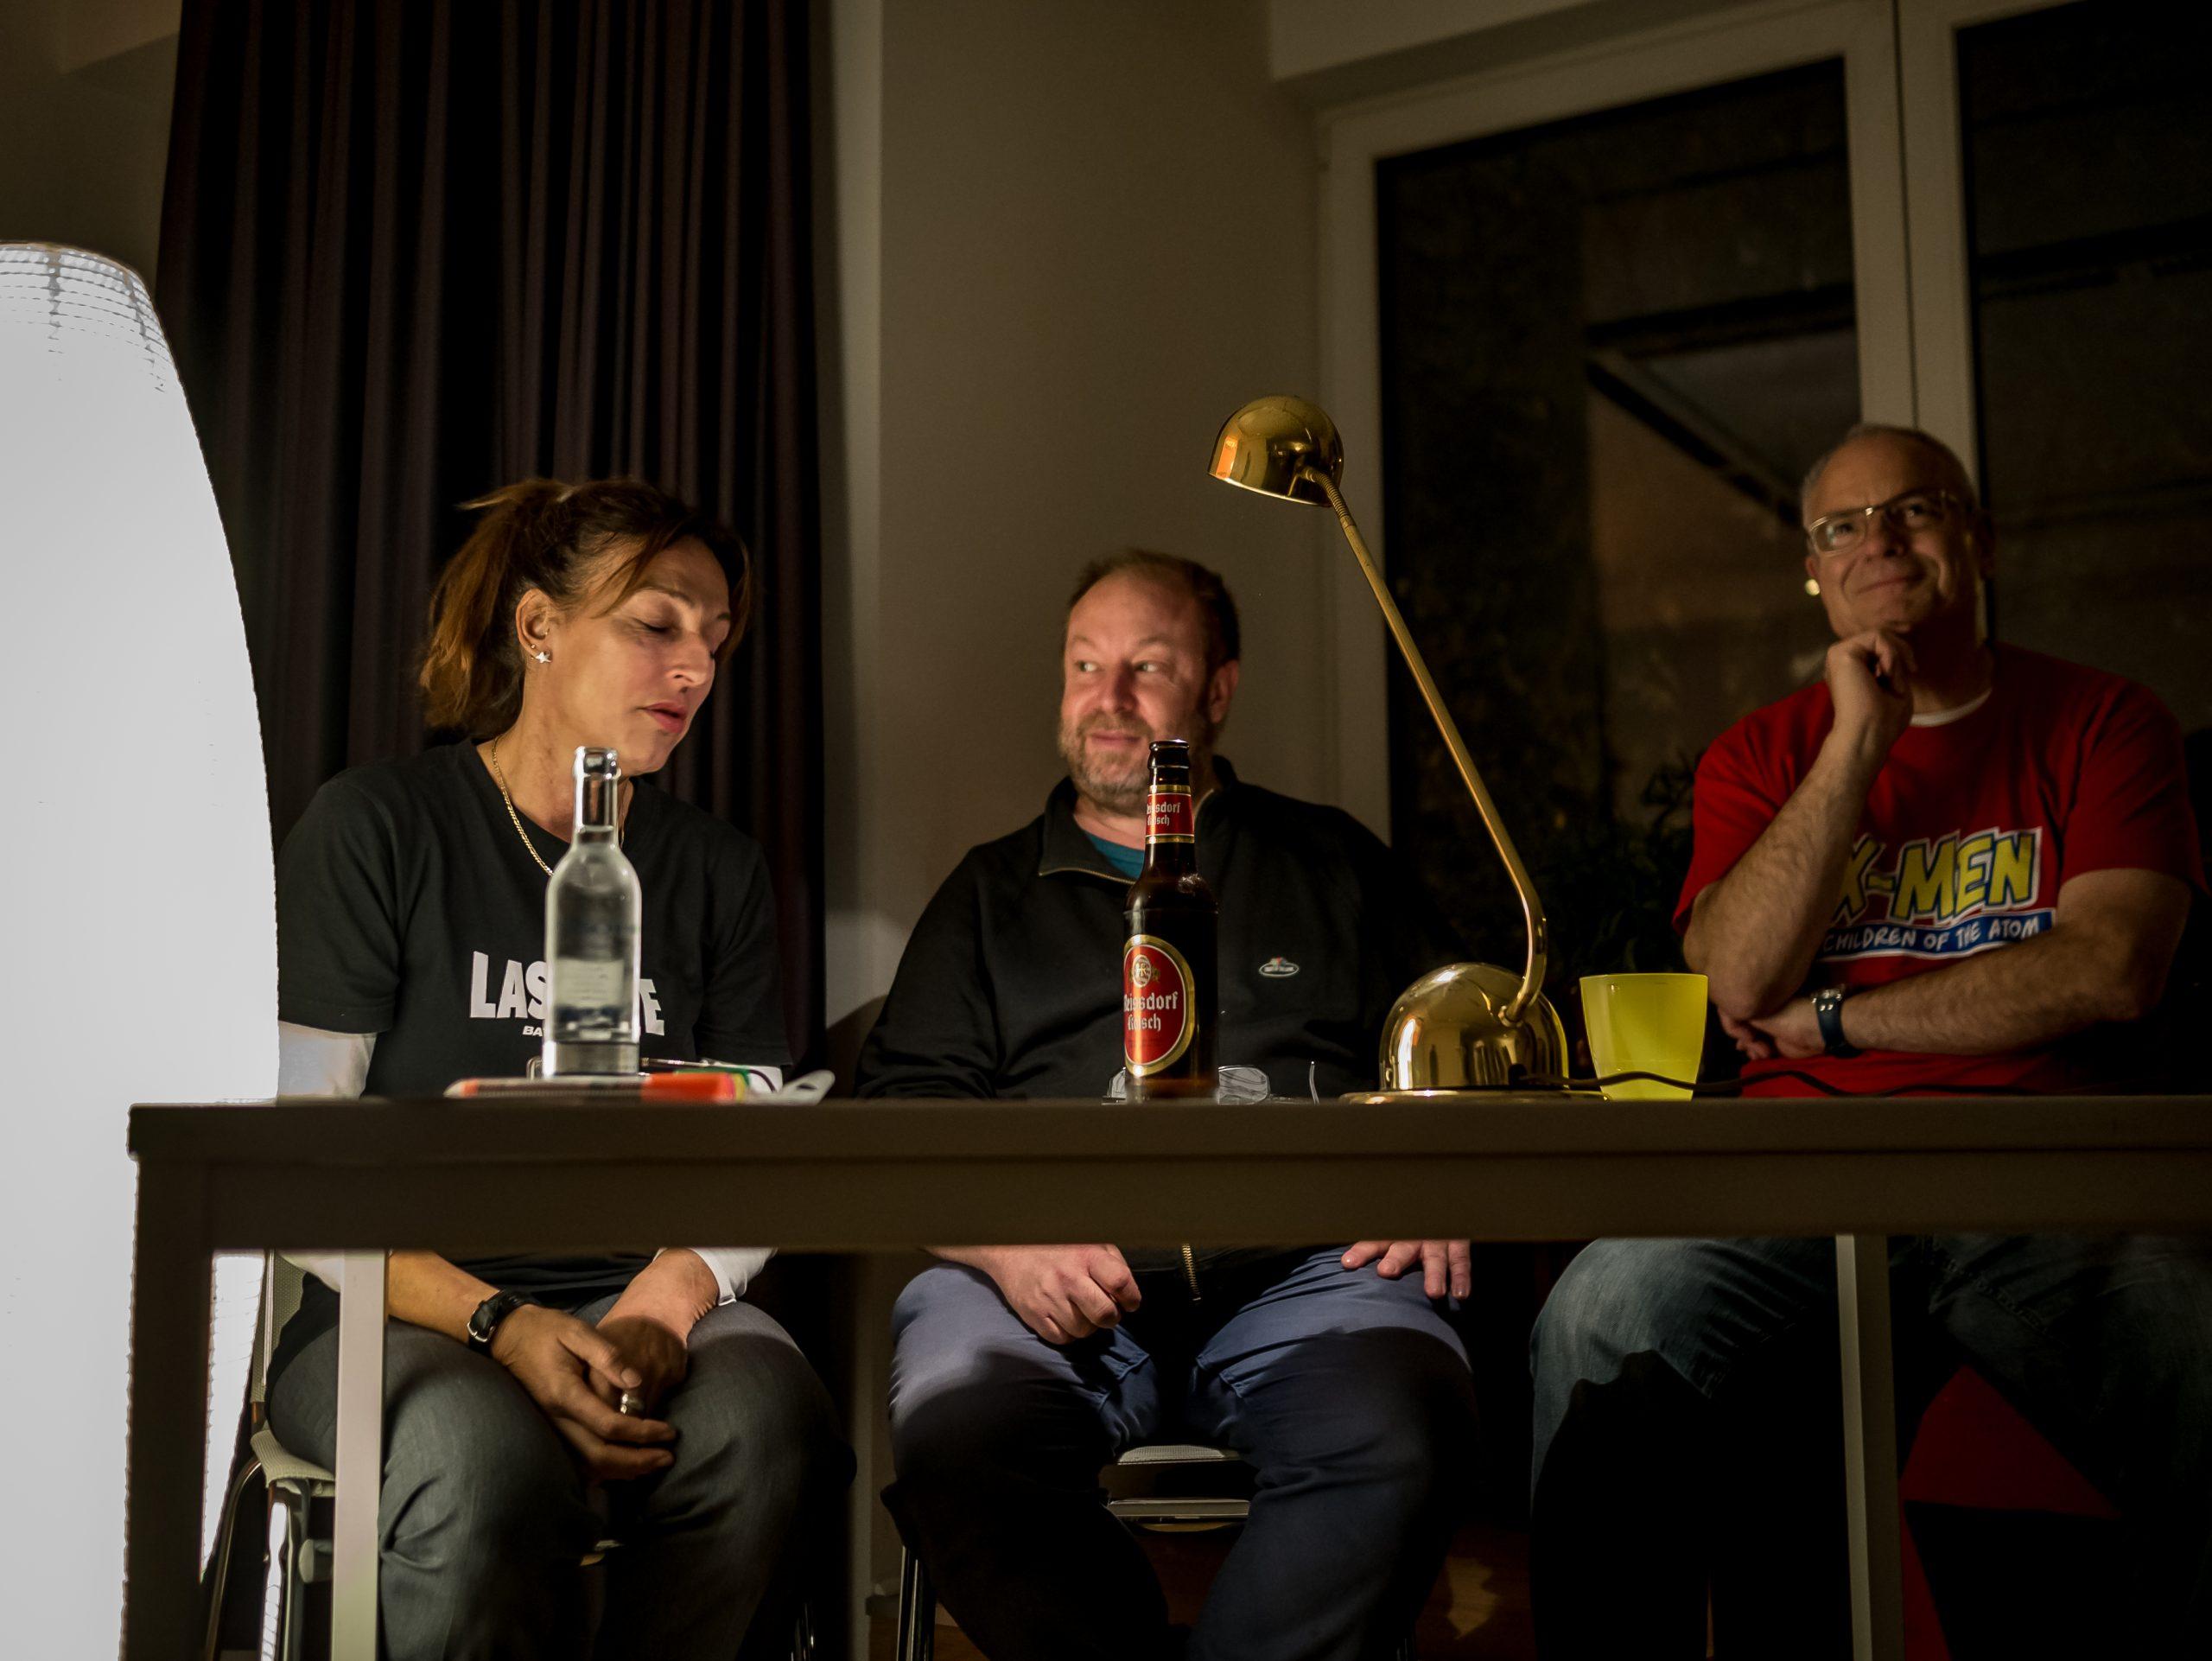 Lesung mit Andrea Volk, Martin Cordemann, Heinz Heidlberger